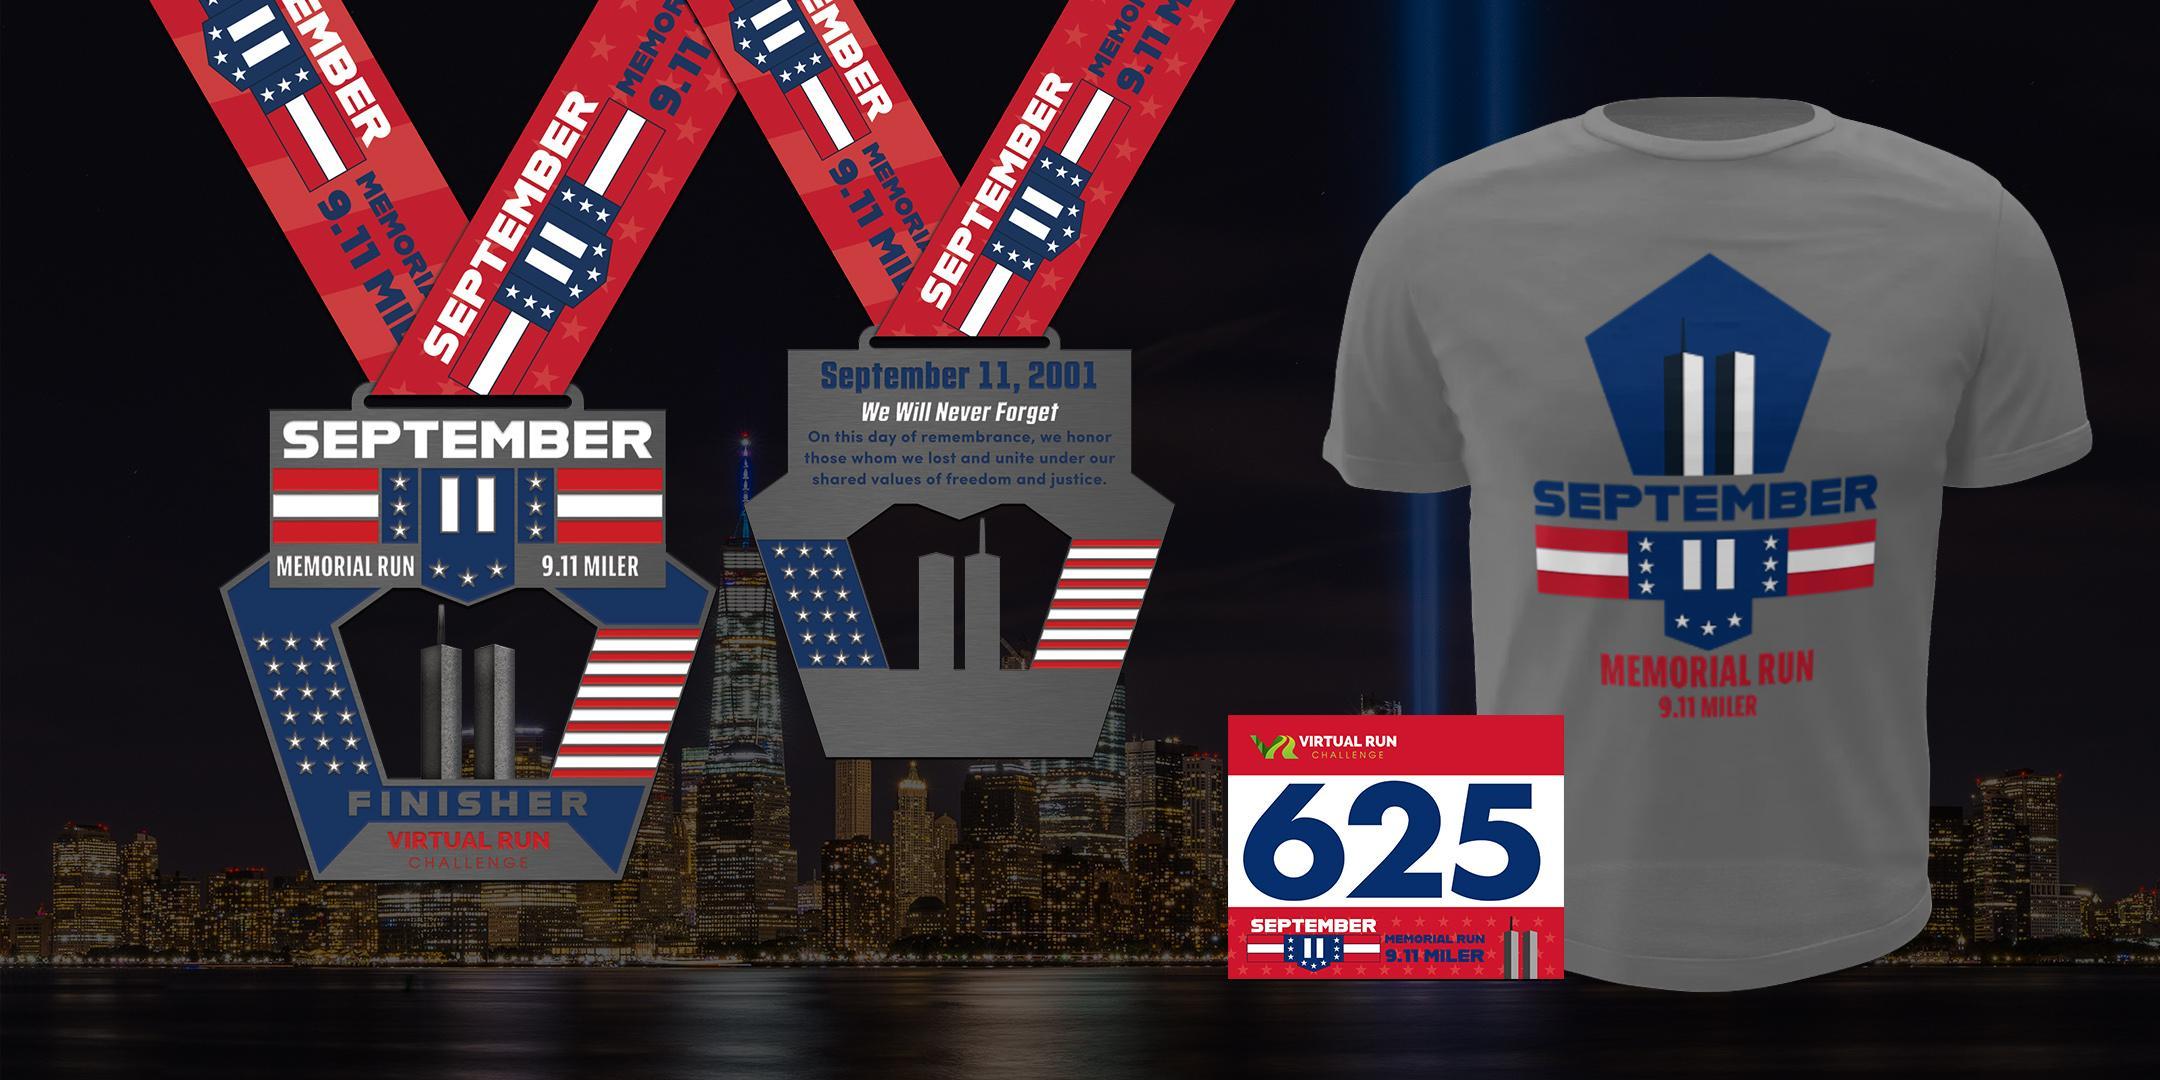 September 11 Memorial Virtual Run Walk (9.11 Miles) - Everett